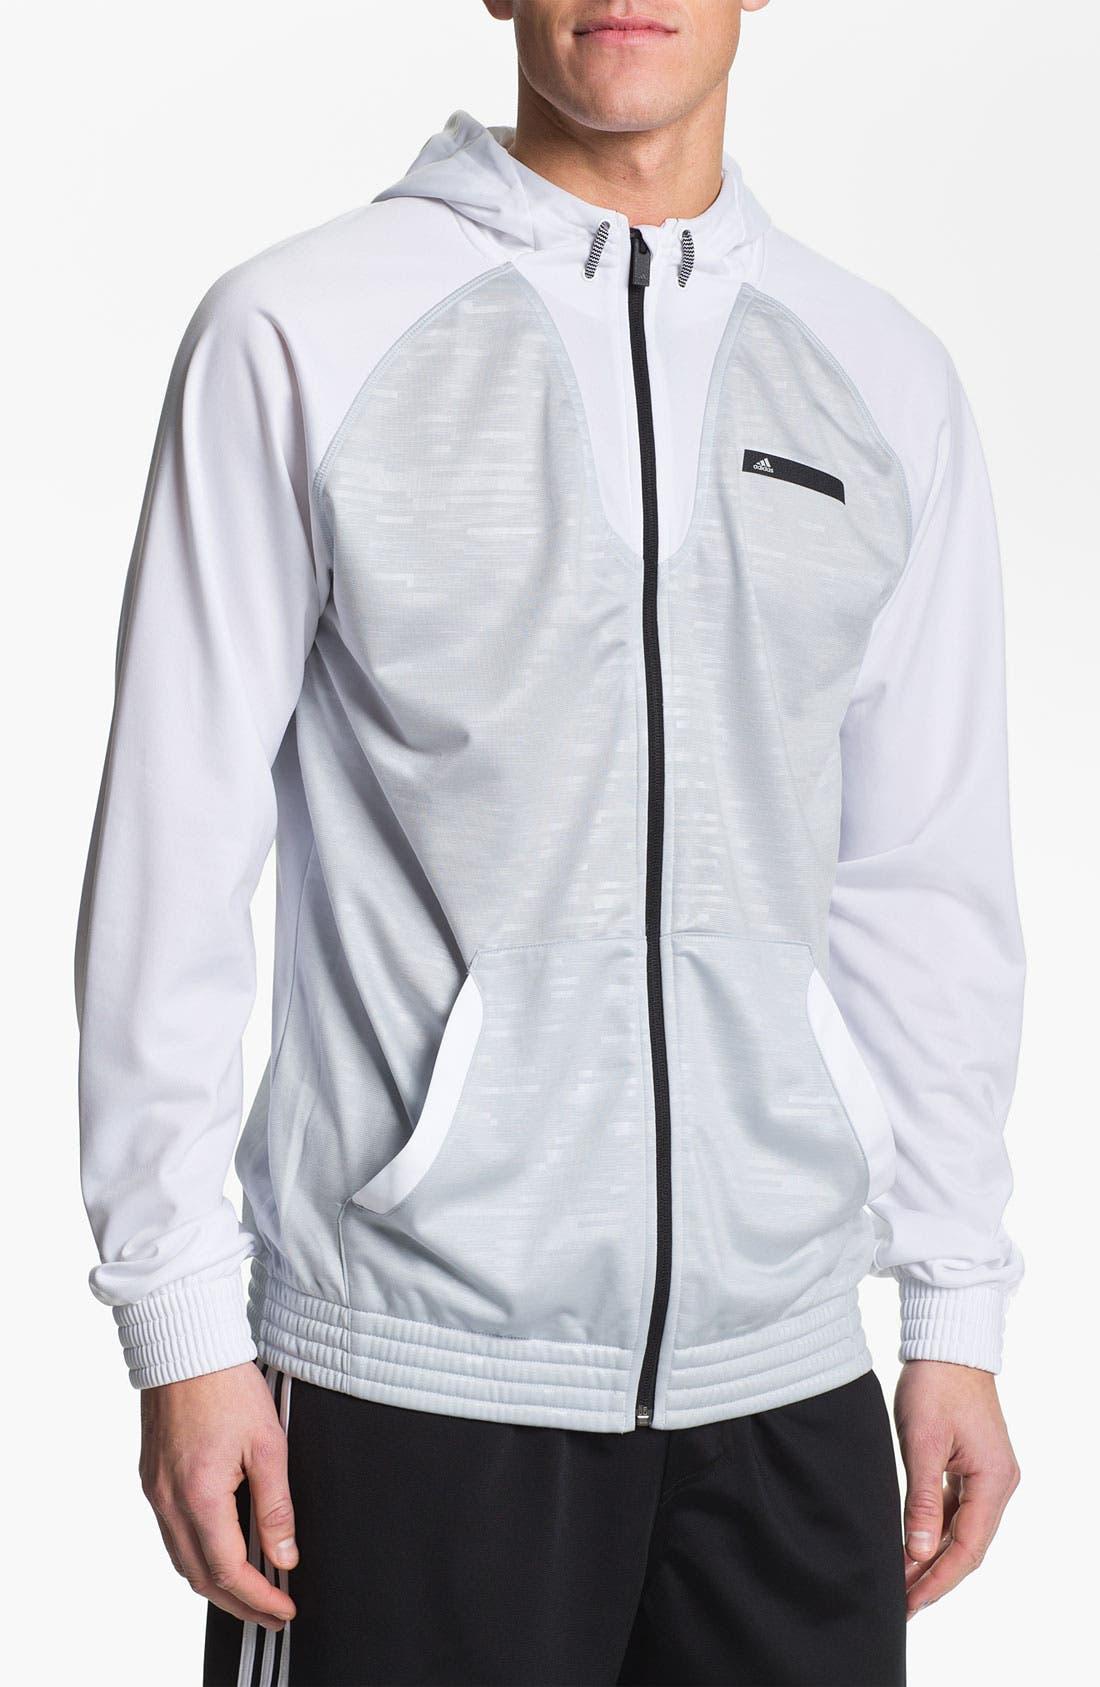 Main Image - adidas 'All World' Jacket